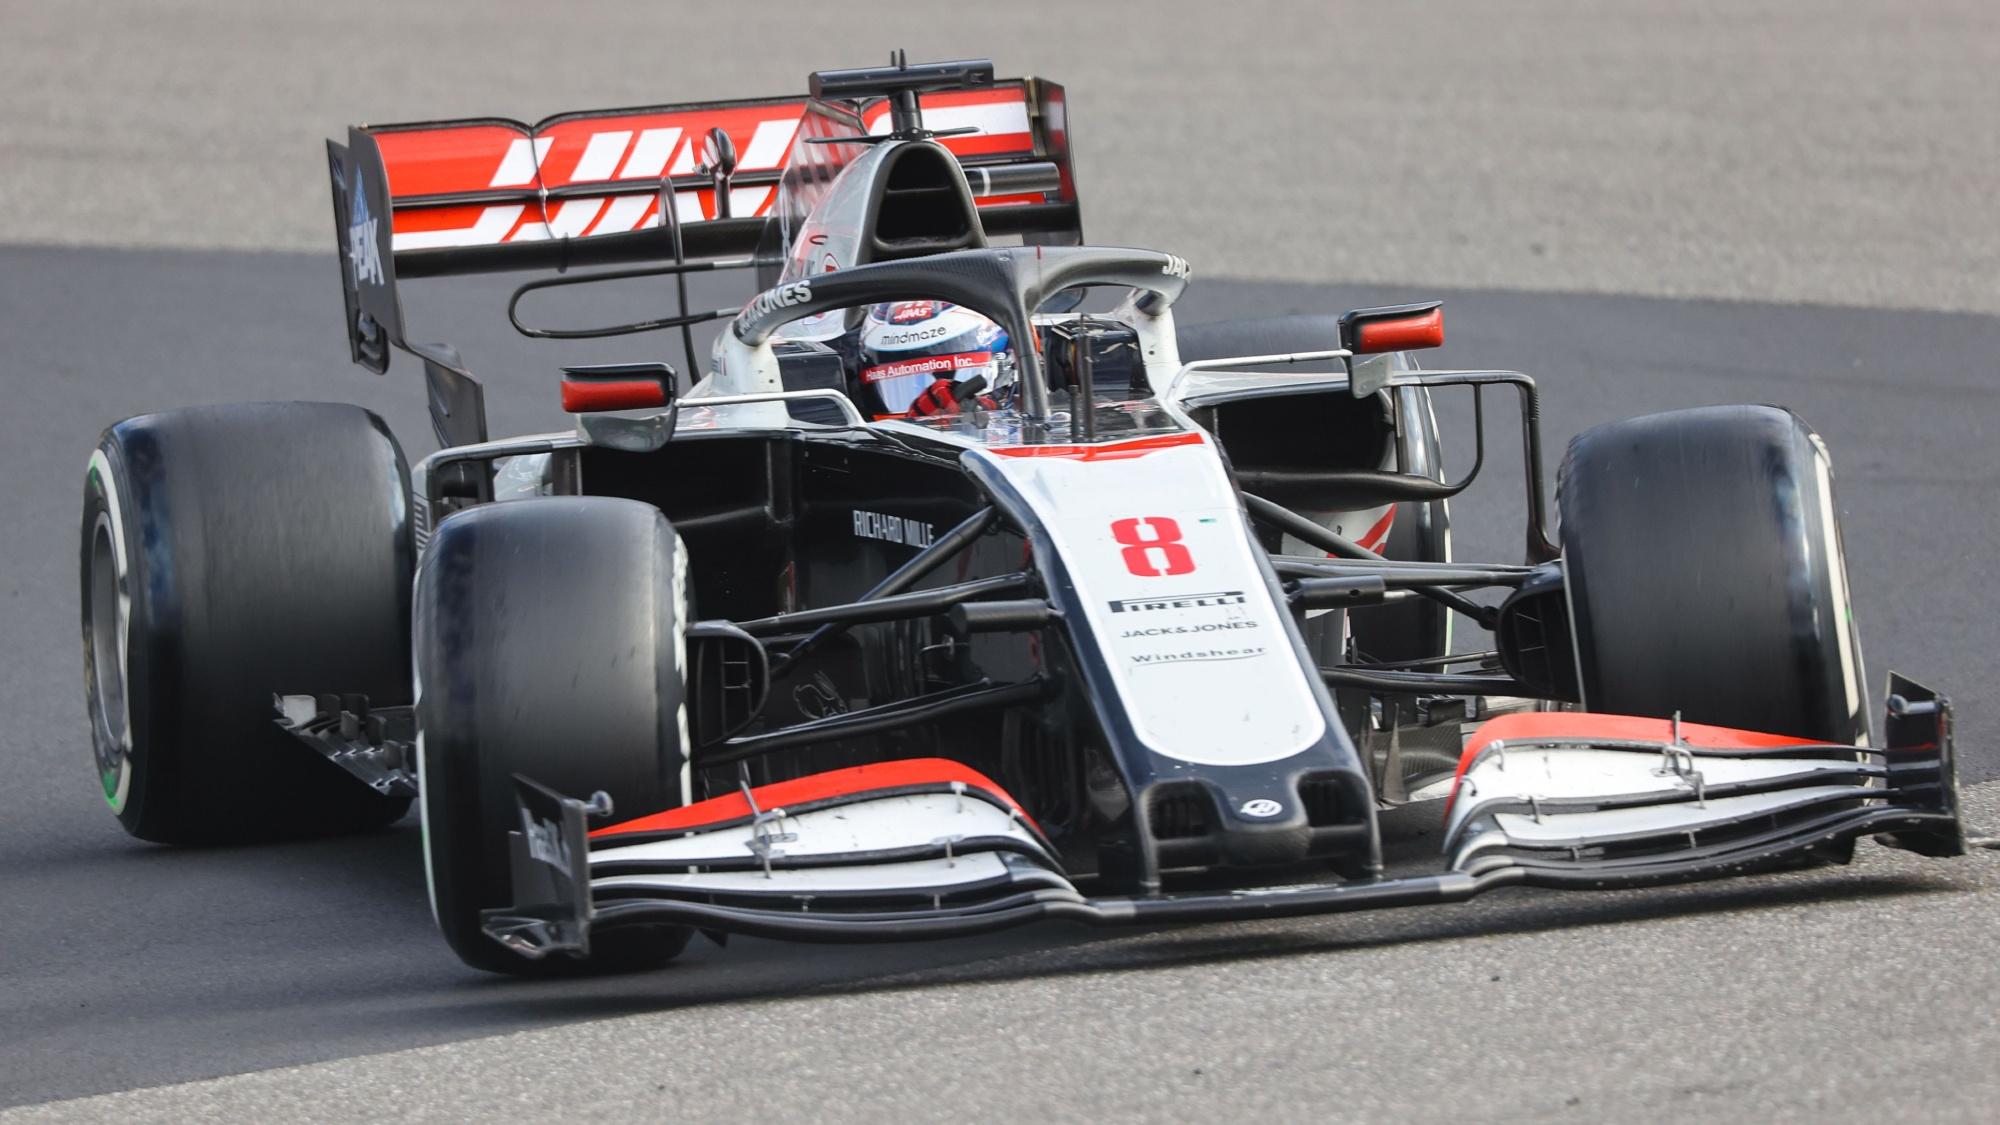 Romain Grosjean, 2020 Eifel GP